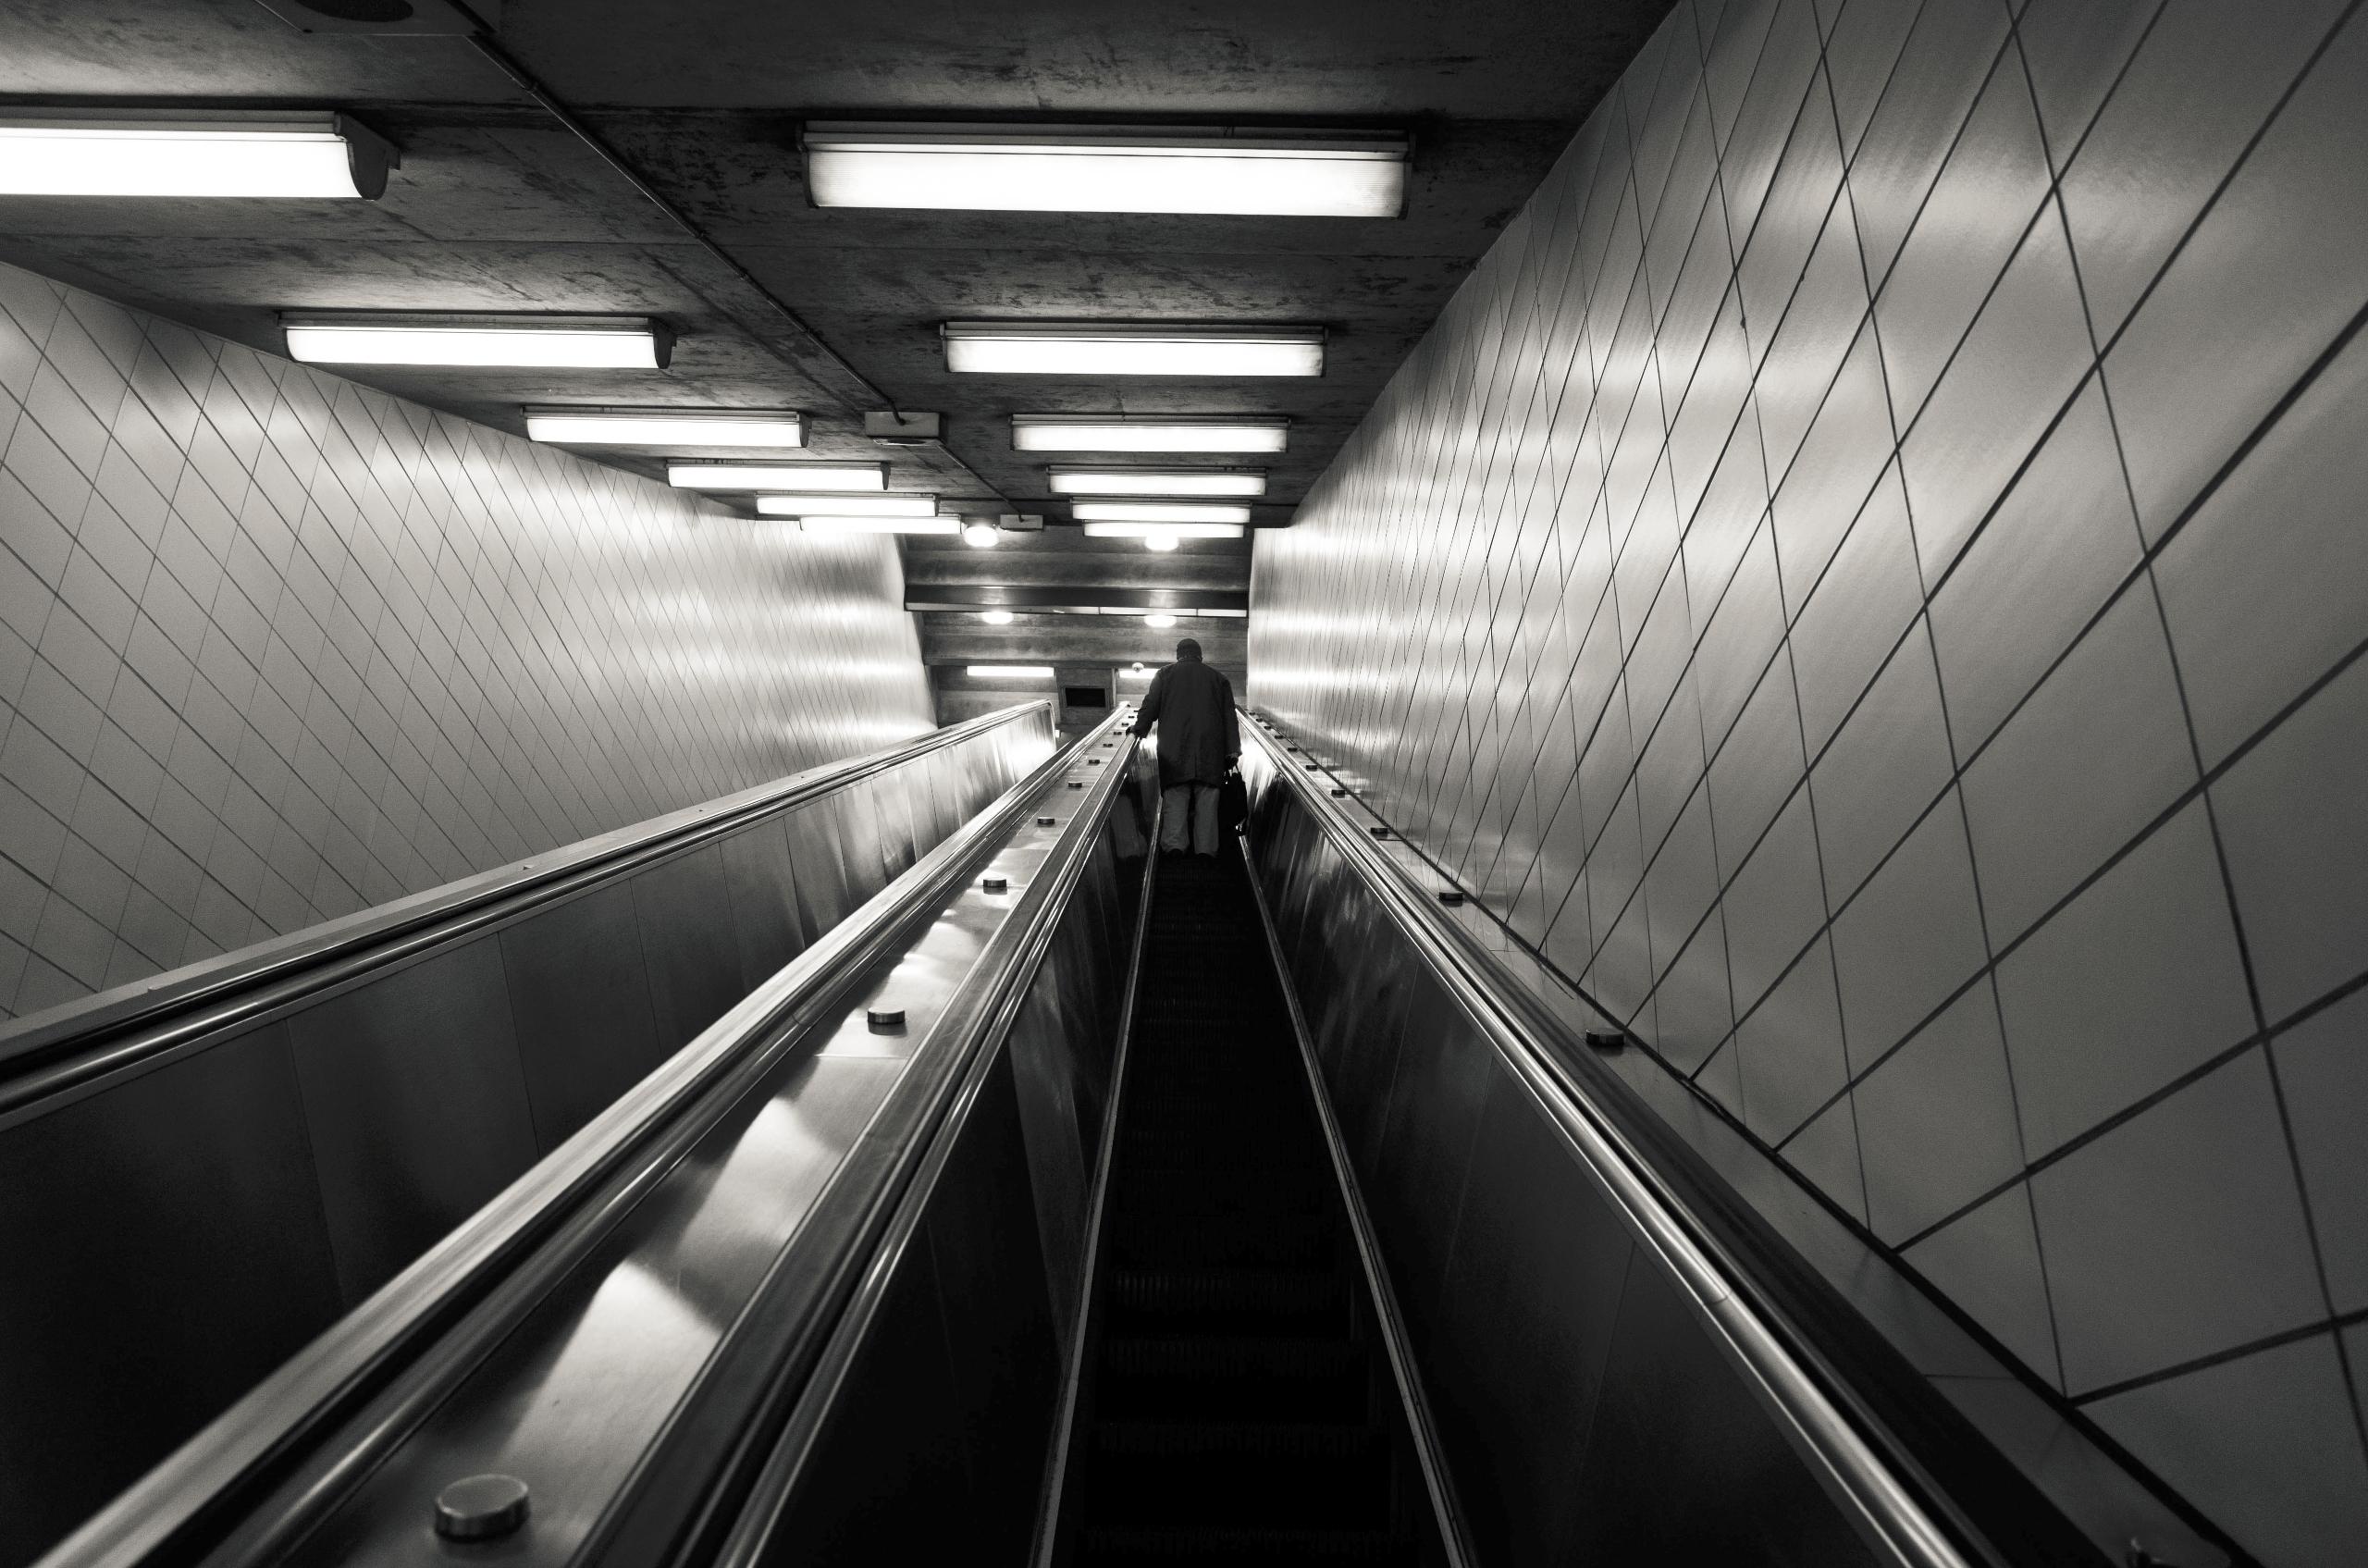 Lonely traveler escalator, Toro - seanrasmussen   ello